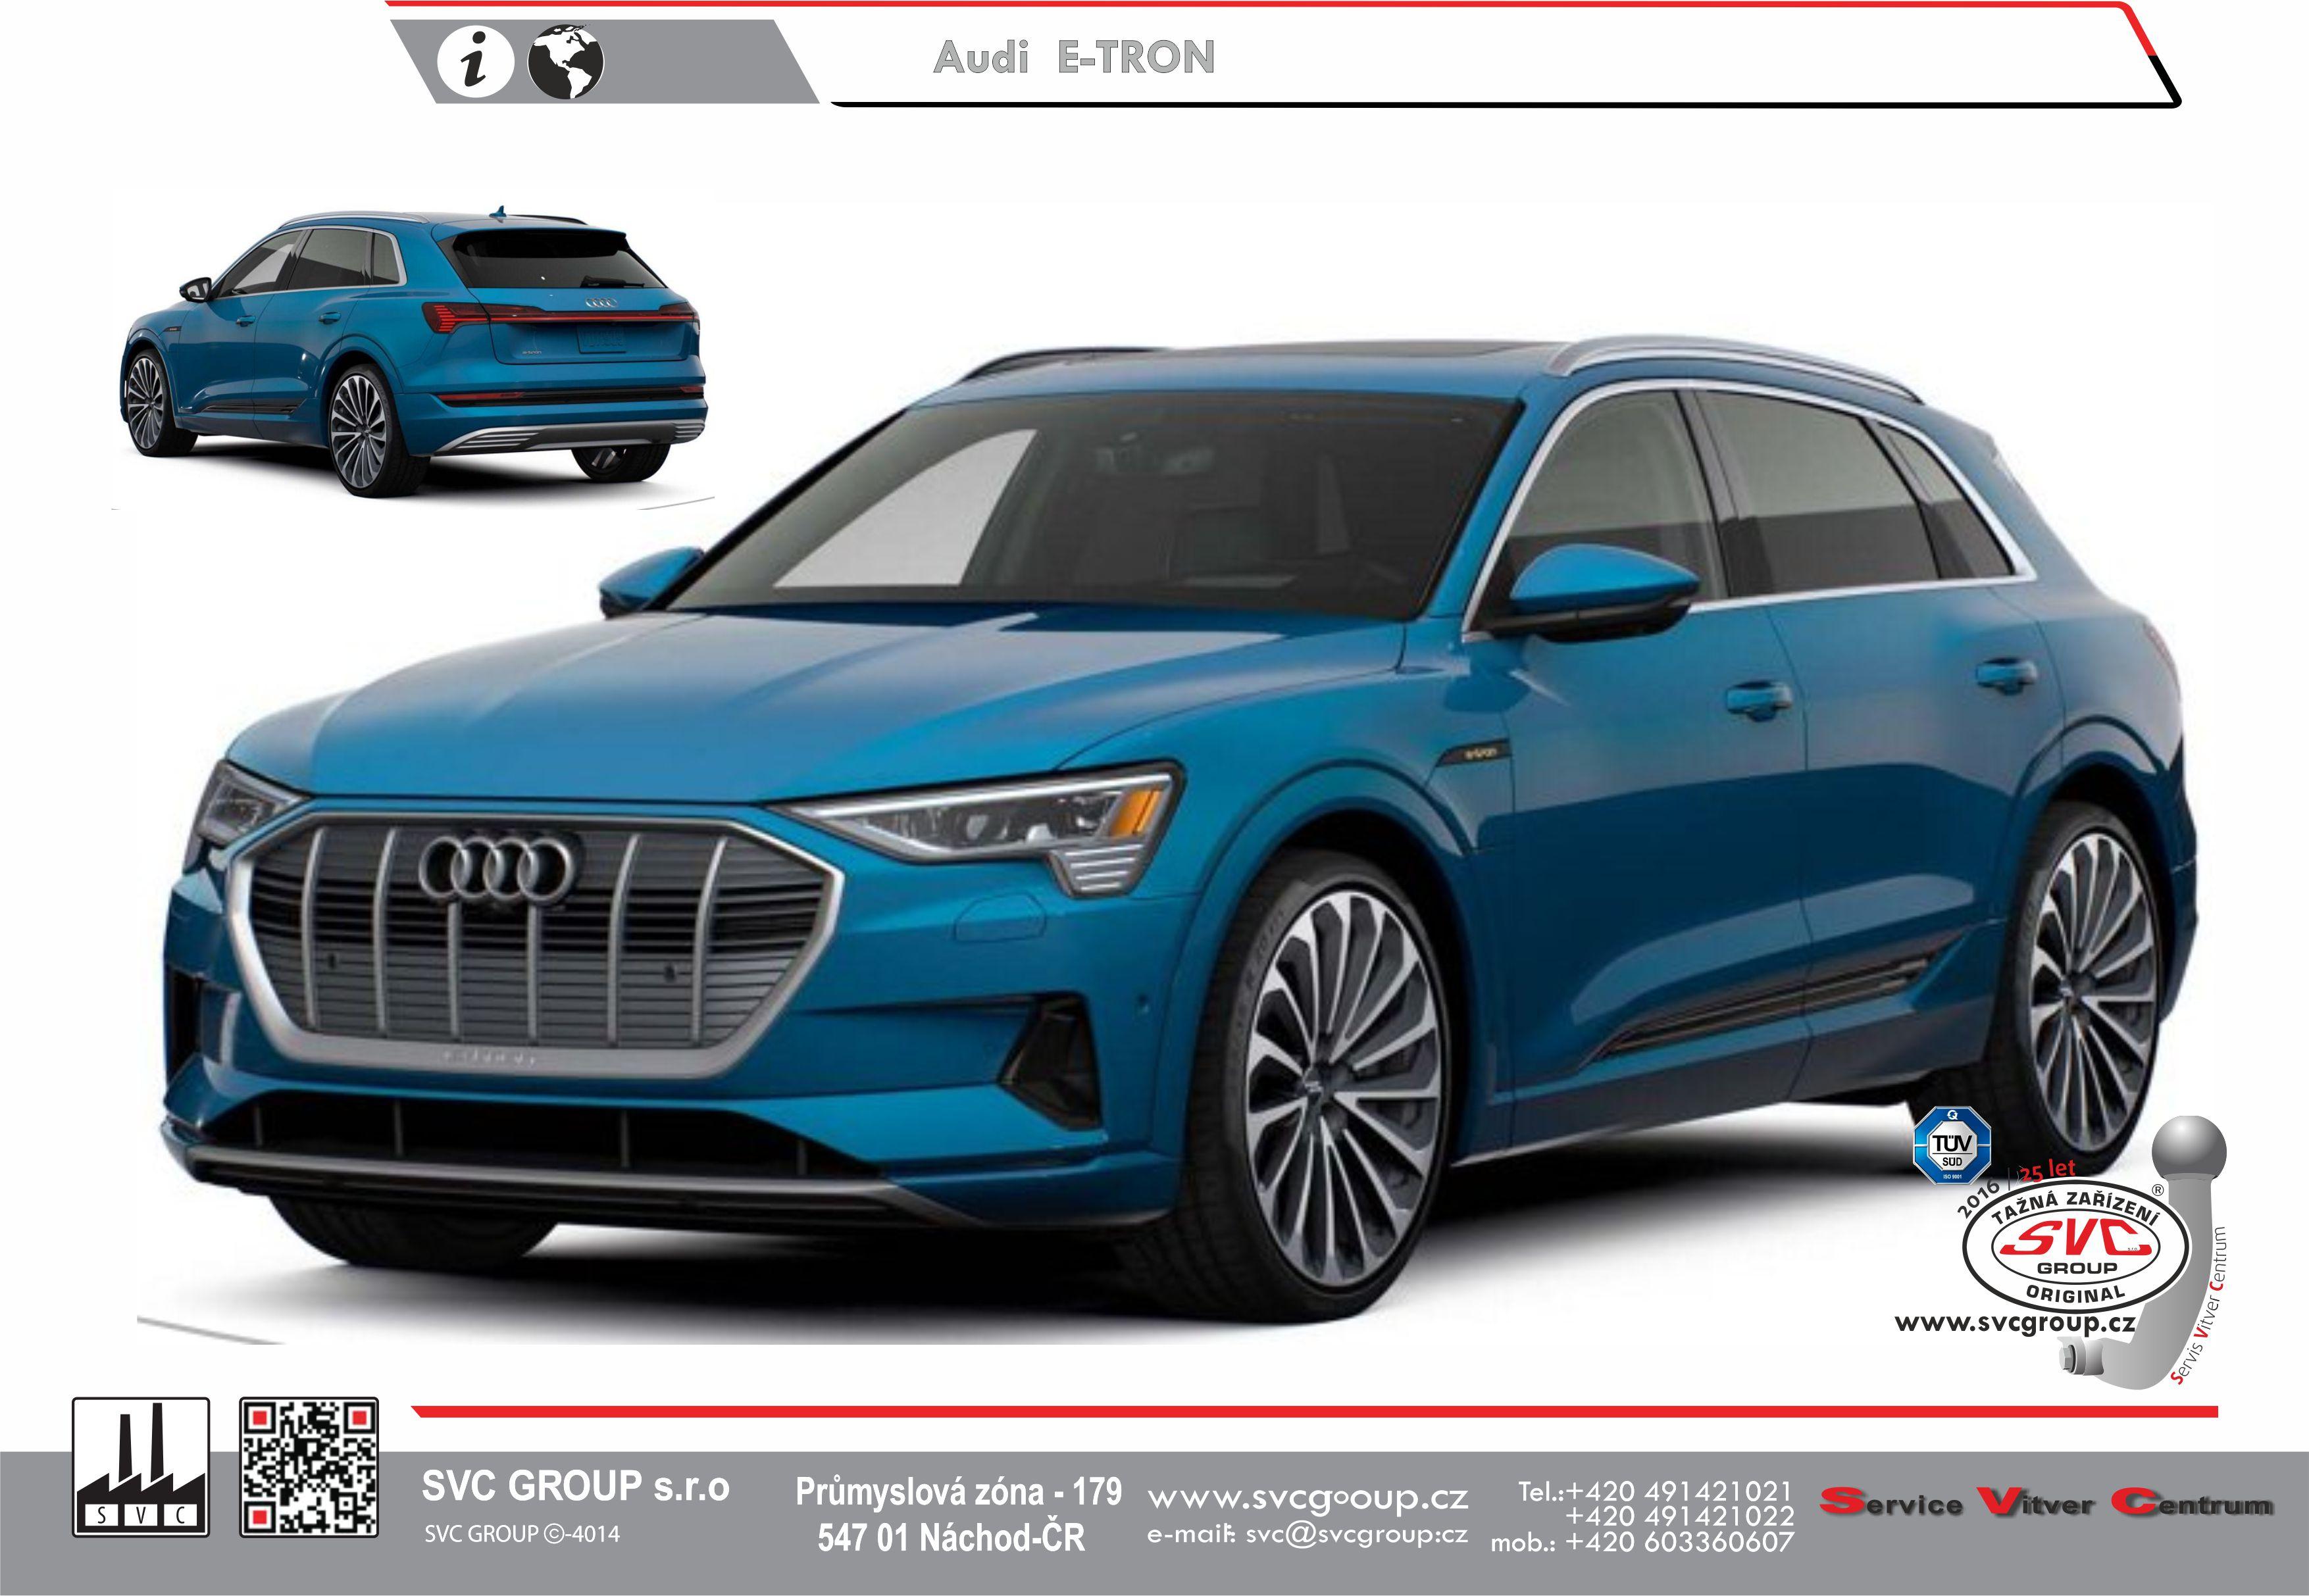 Audi Q7 E-TRON